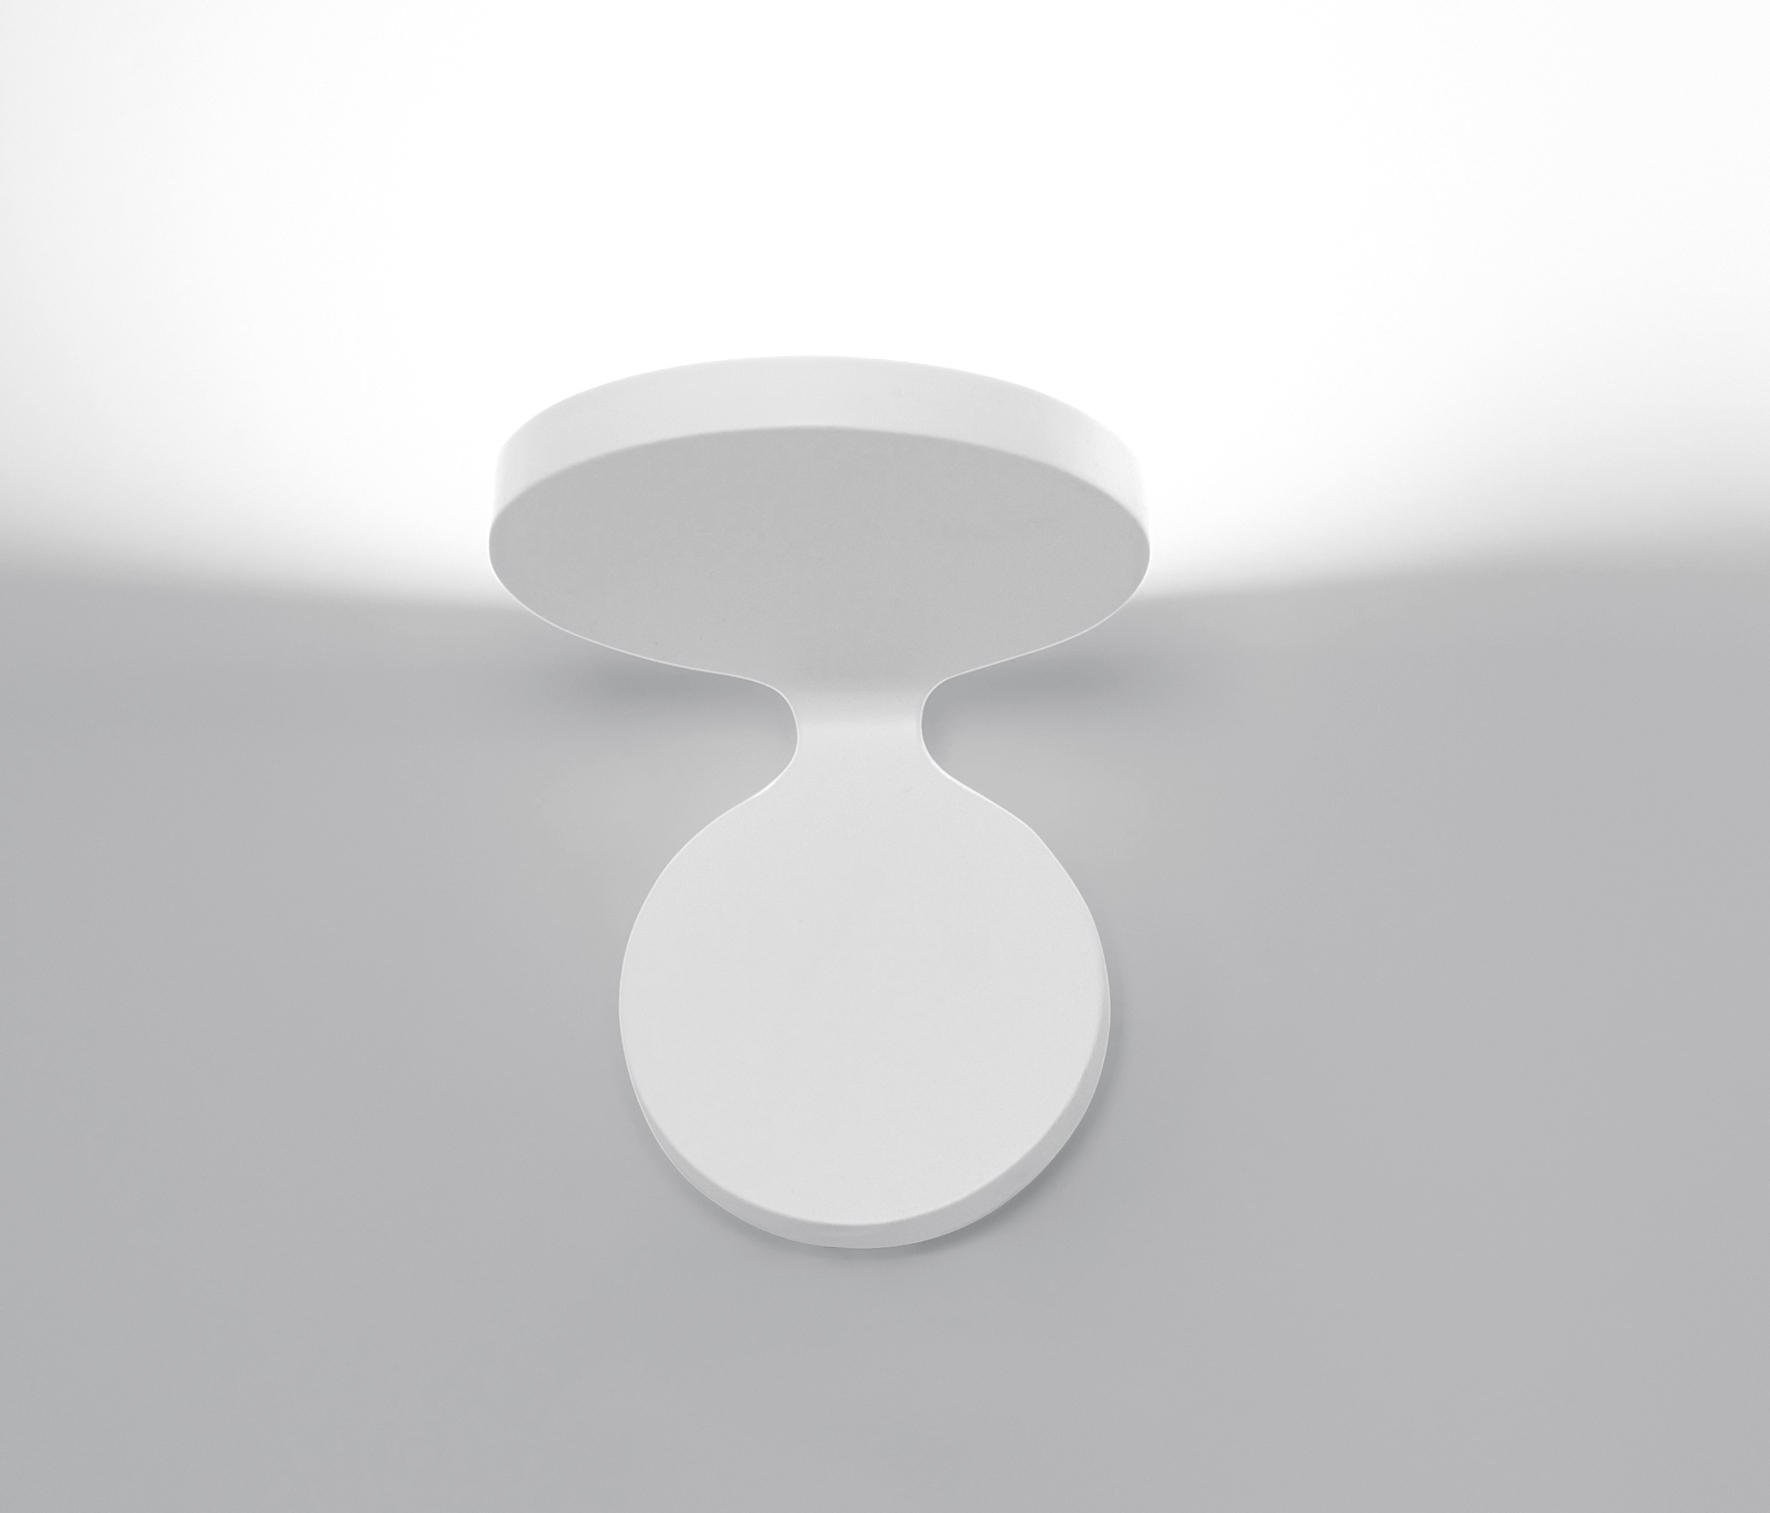 Artemide Wall Lights: Rea 12 Wall Lamp by Artemide | General lighting,Lighting